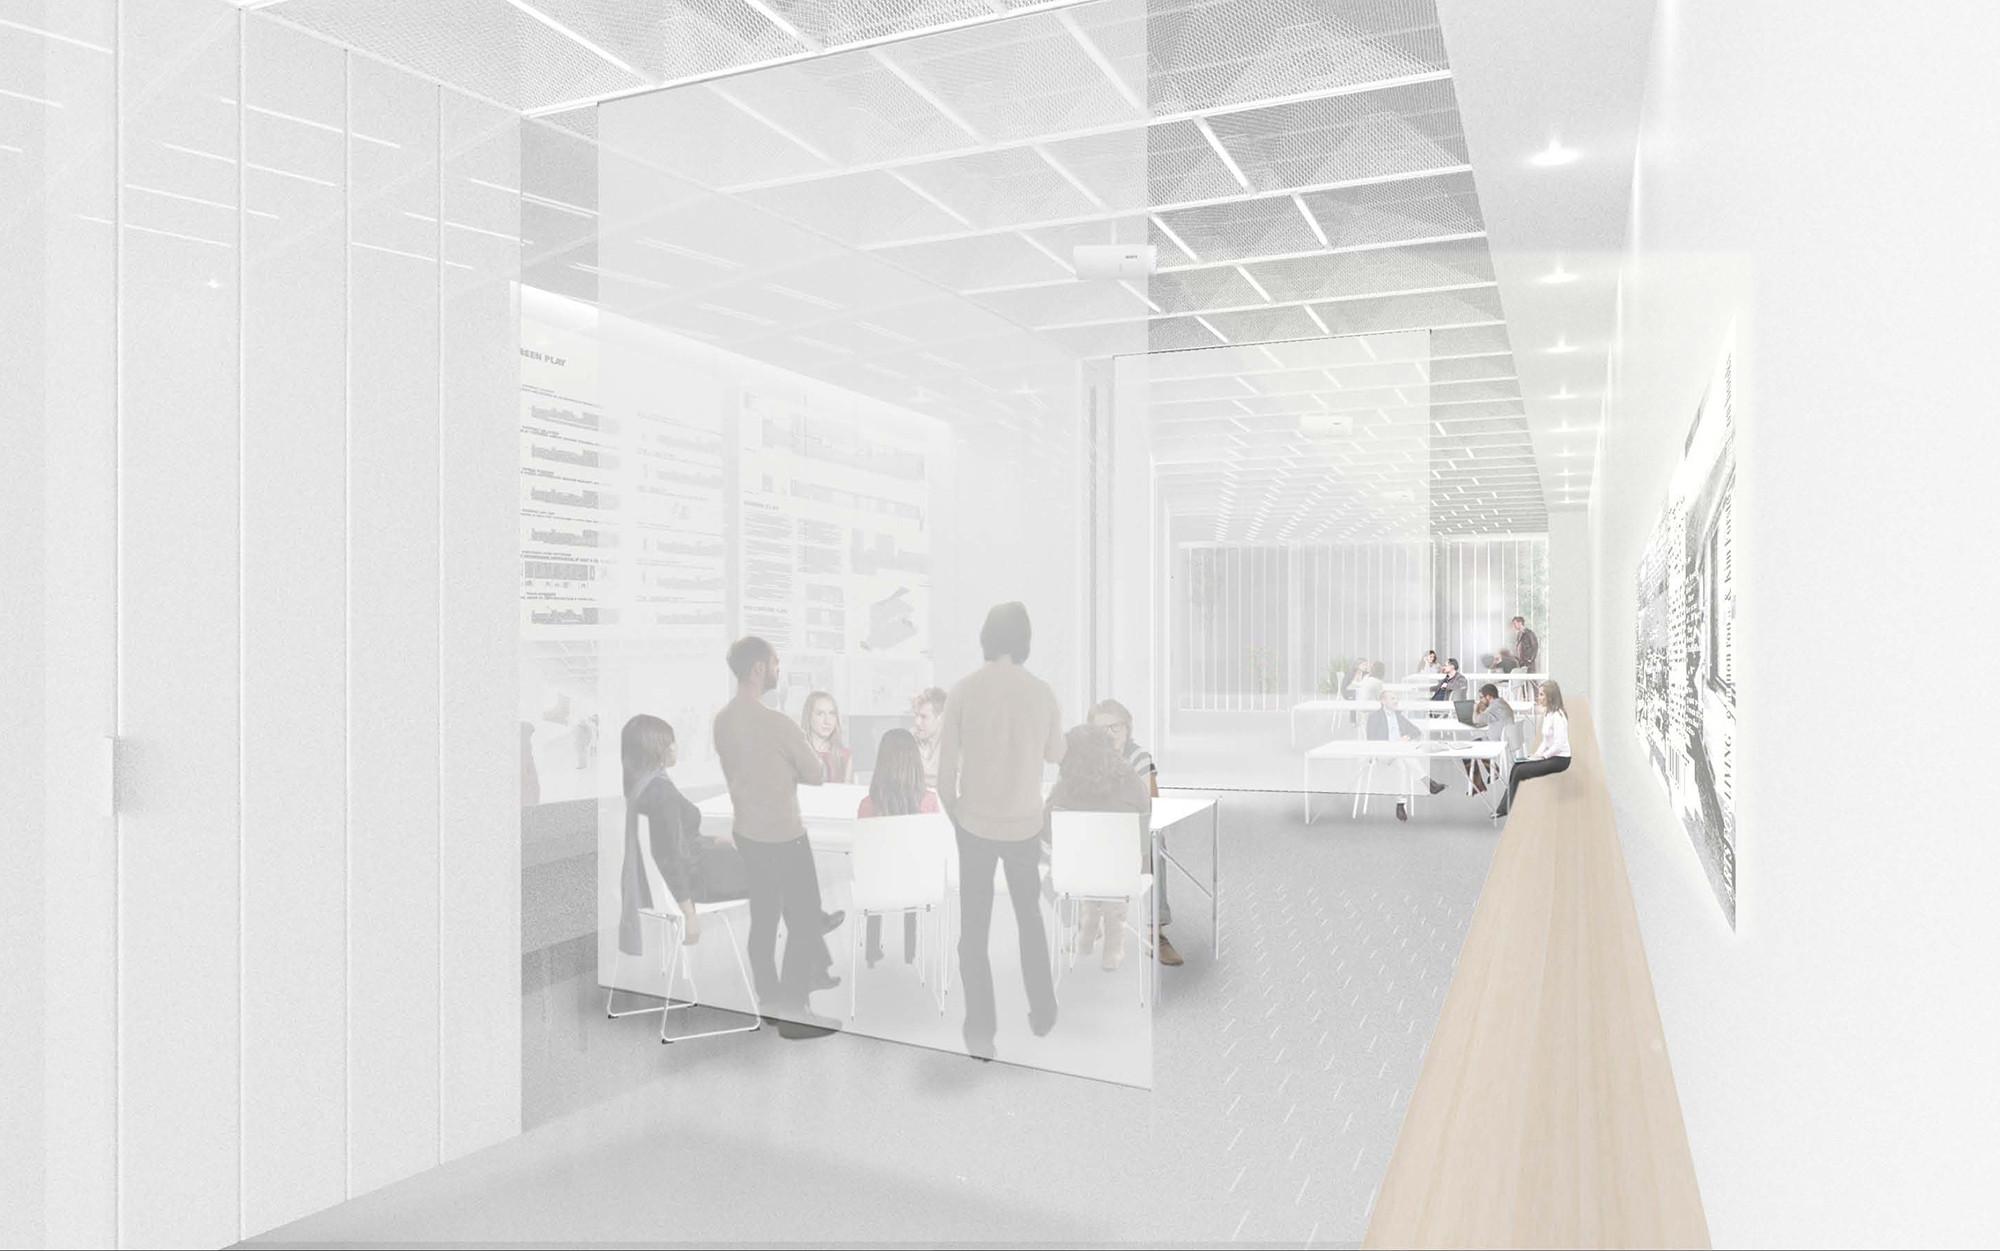 Office scenario. Image © Collective-LOK